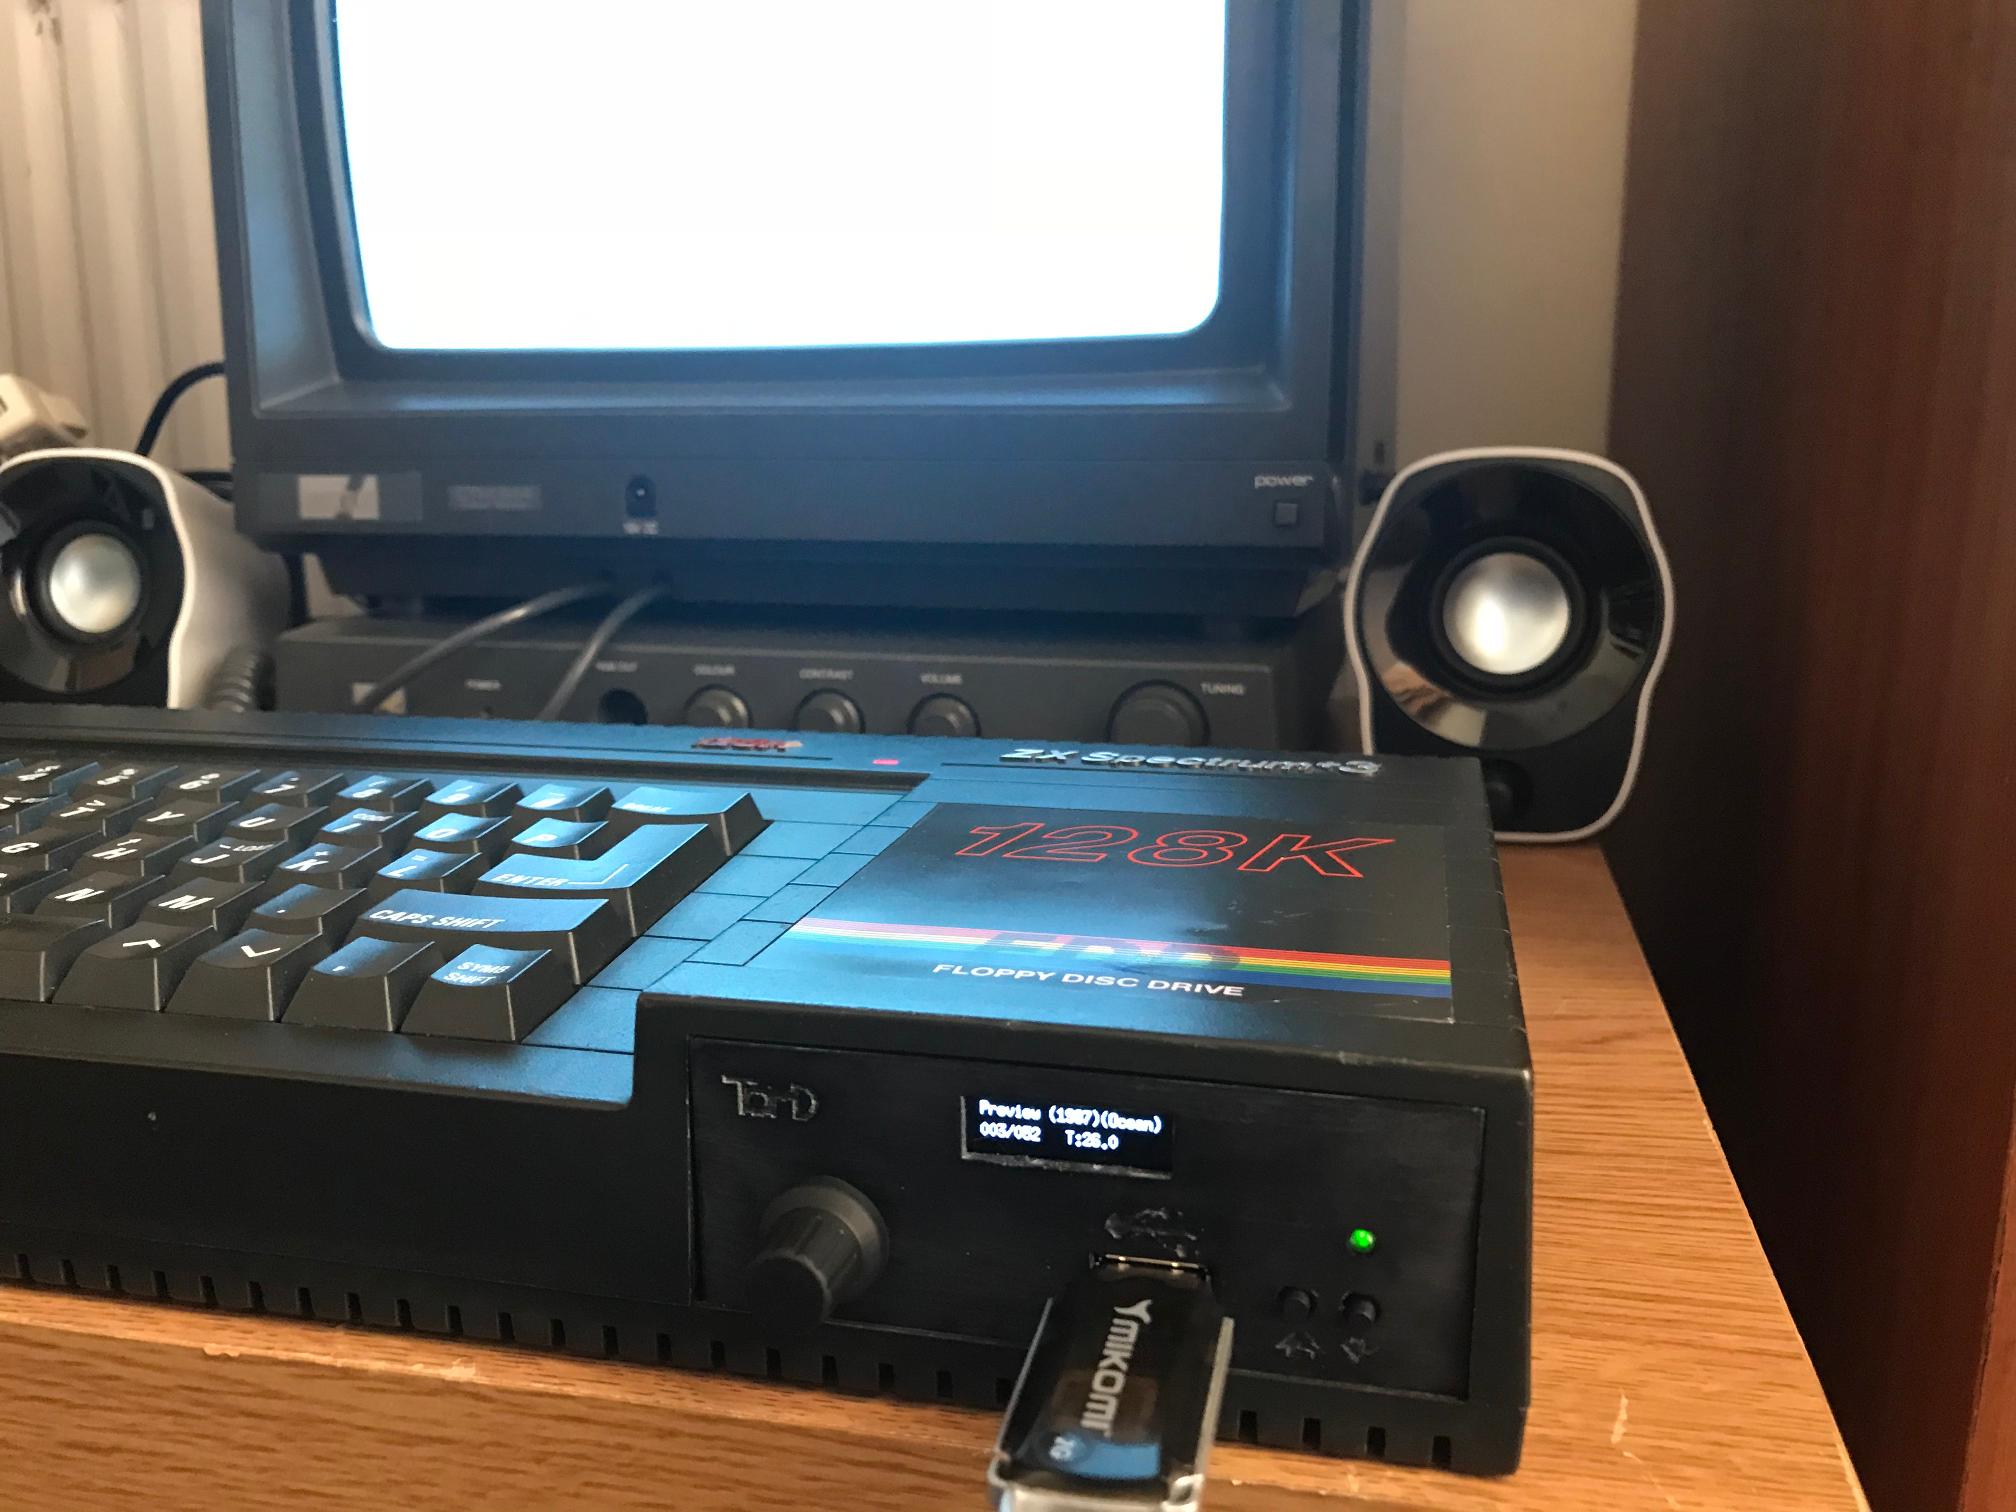 ZX Spectrum +3 & Amstrad CPC6128/664 Internal USB Floppy